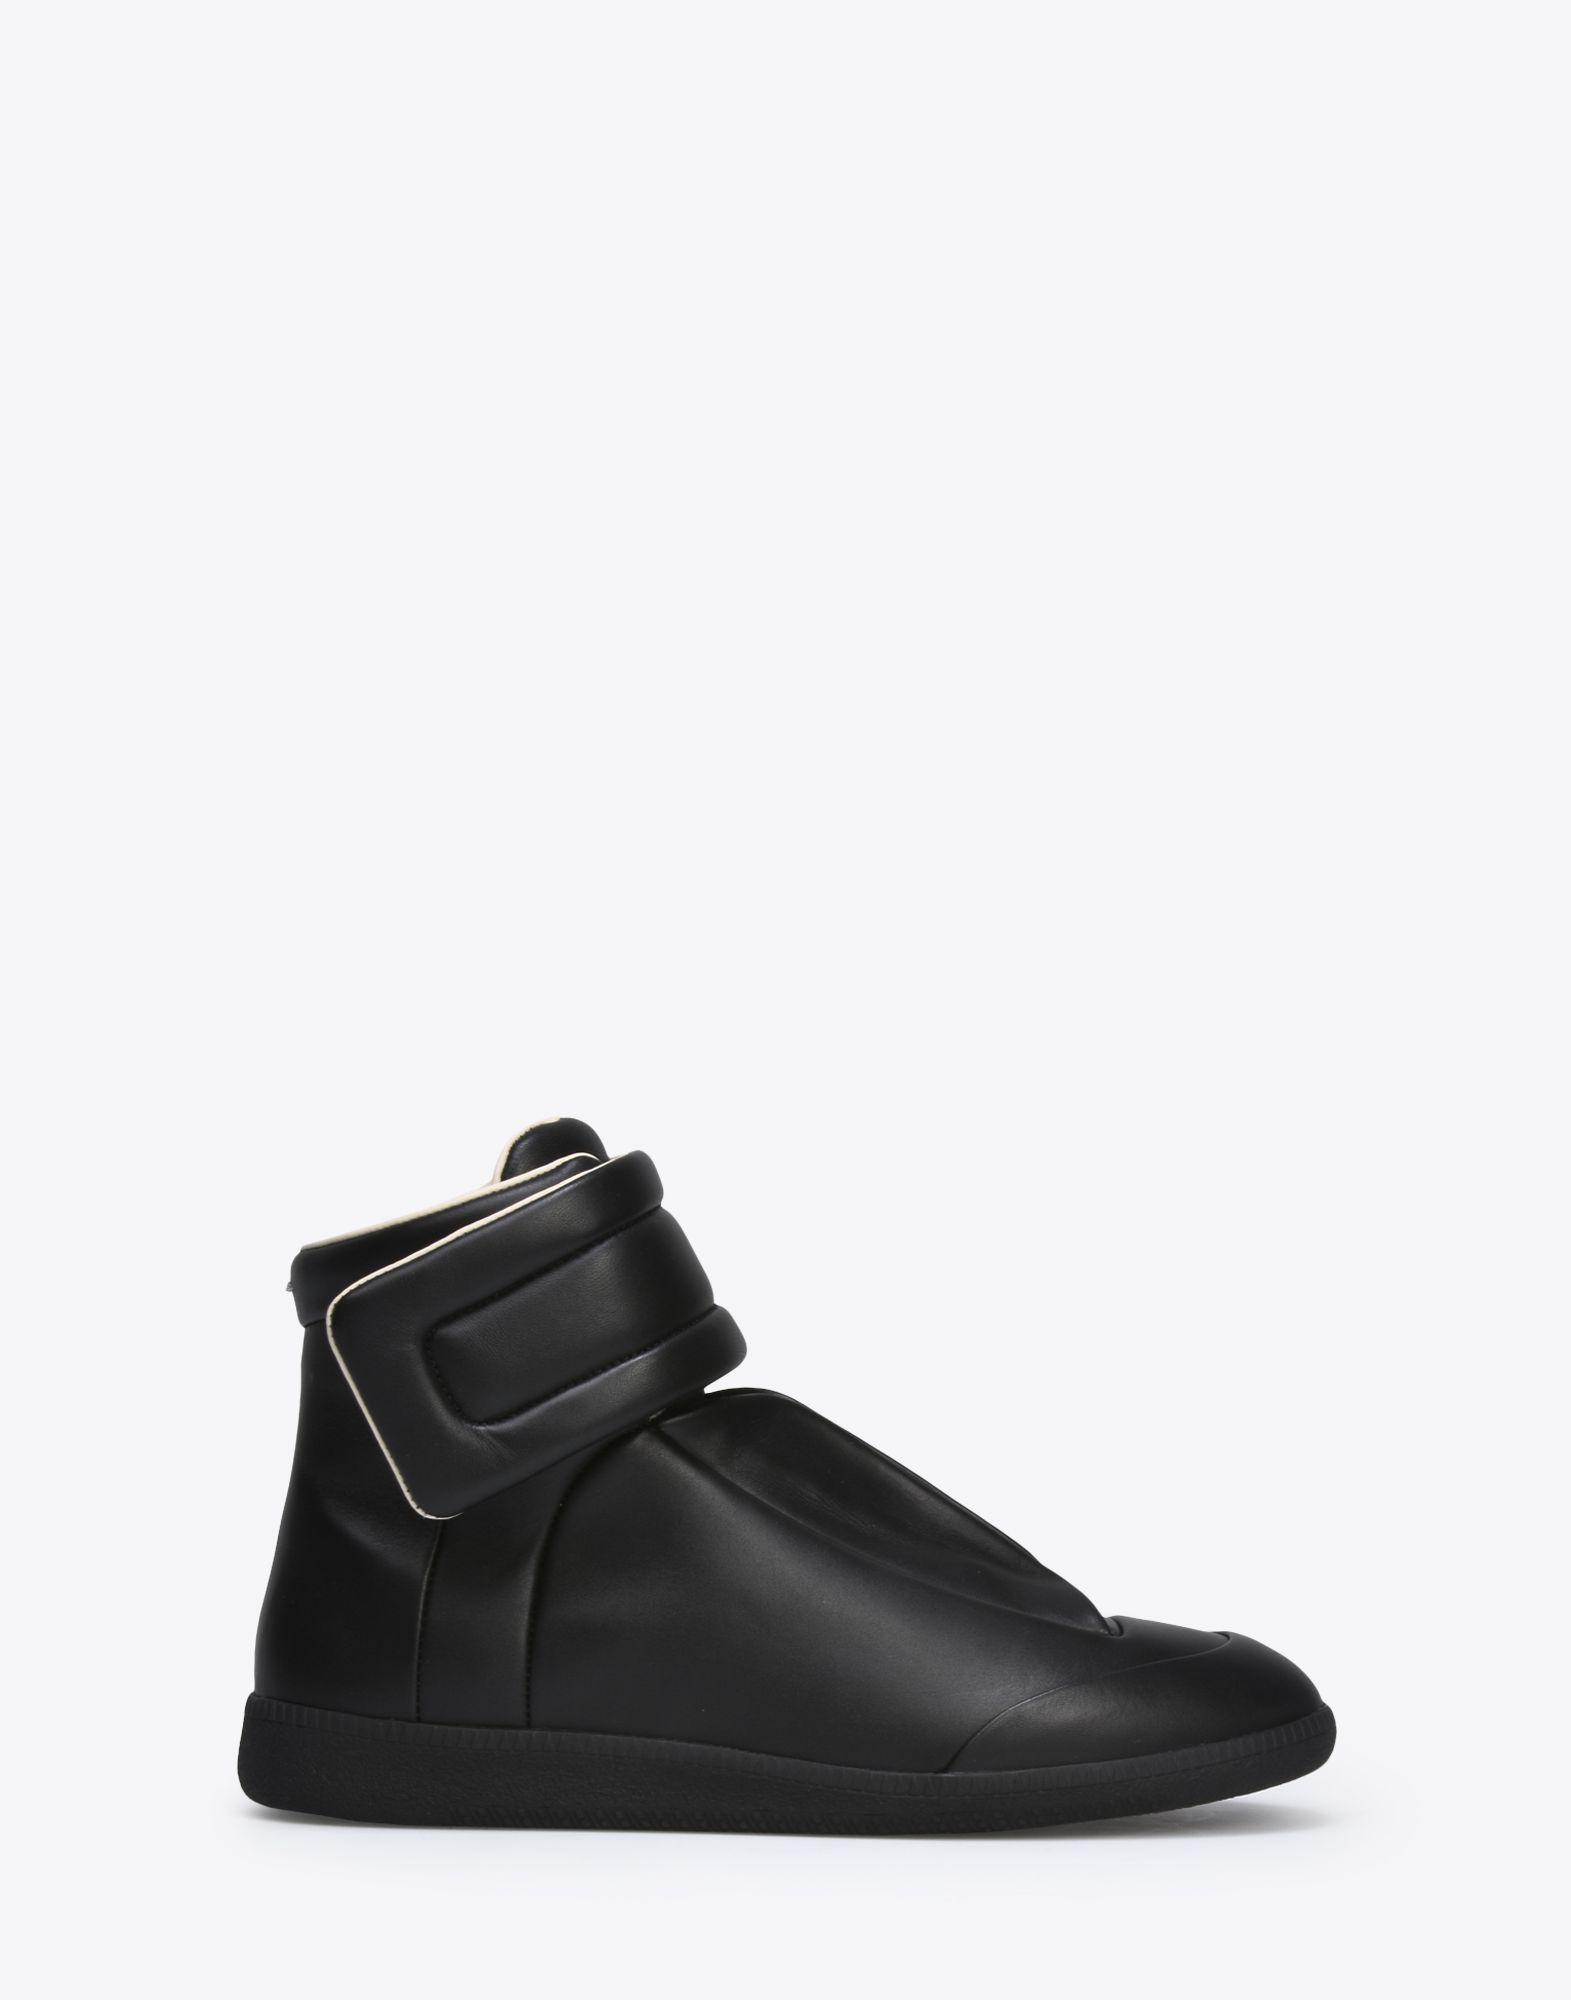 Maison margiela calfskin future high top trainers in black for Ma maison scarpe